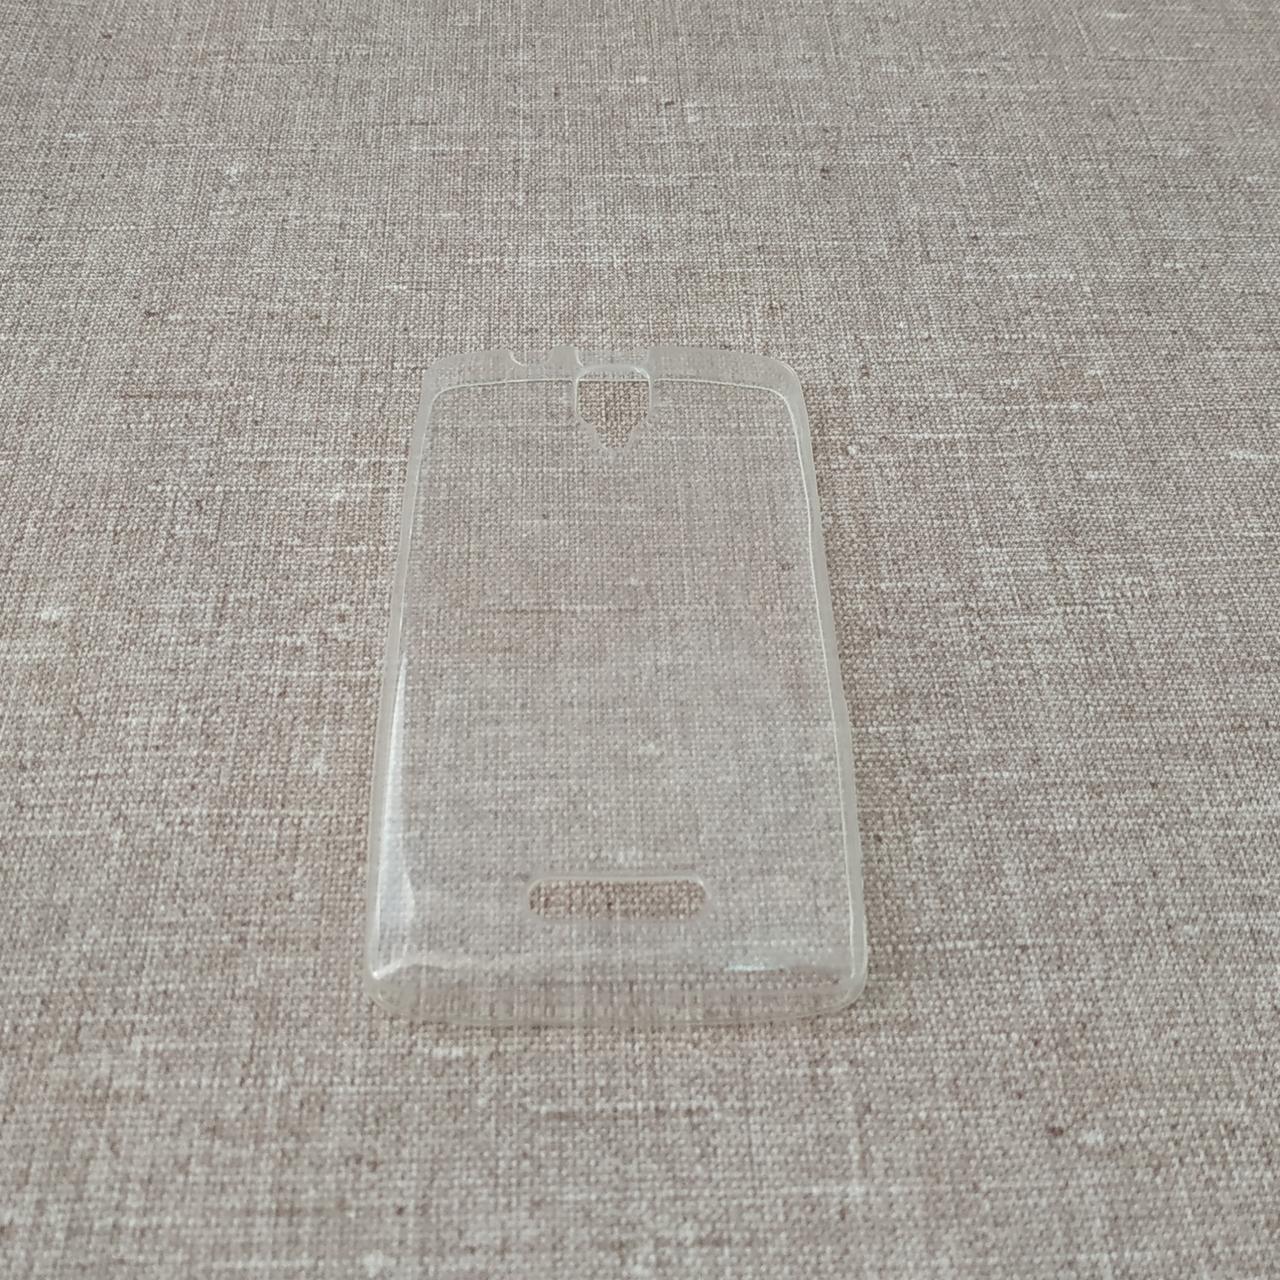 TPU Ultrathin 0.33mm Lenovo A1000 soft-clear